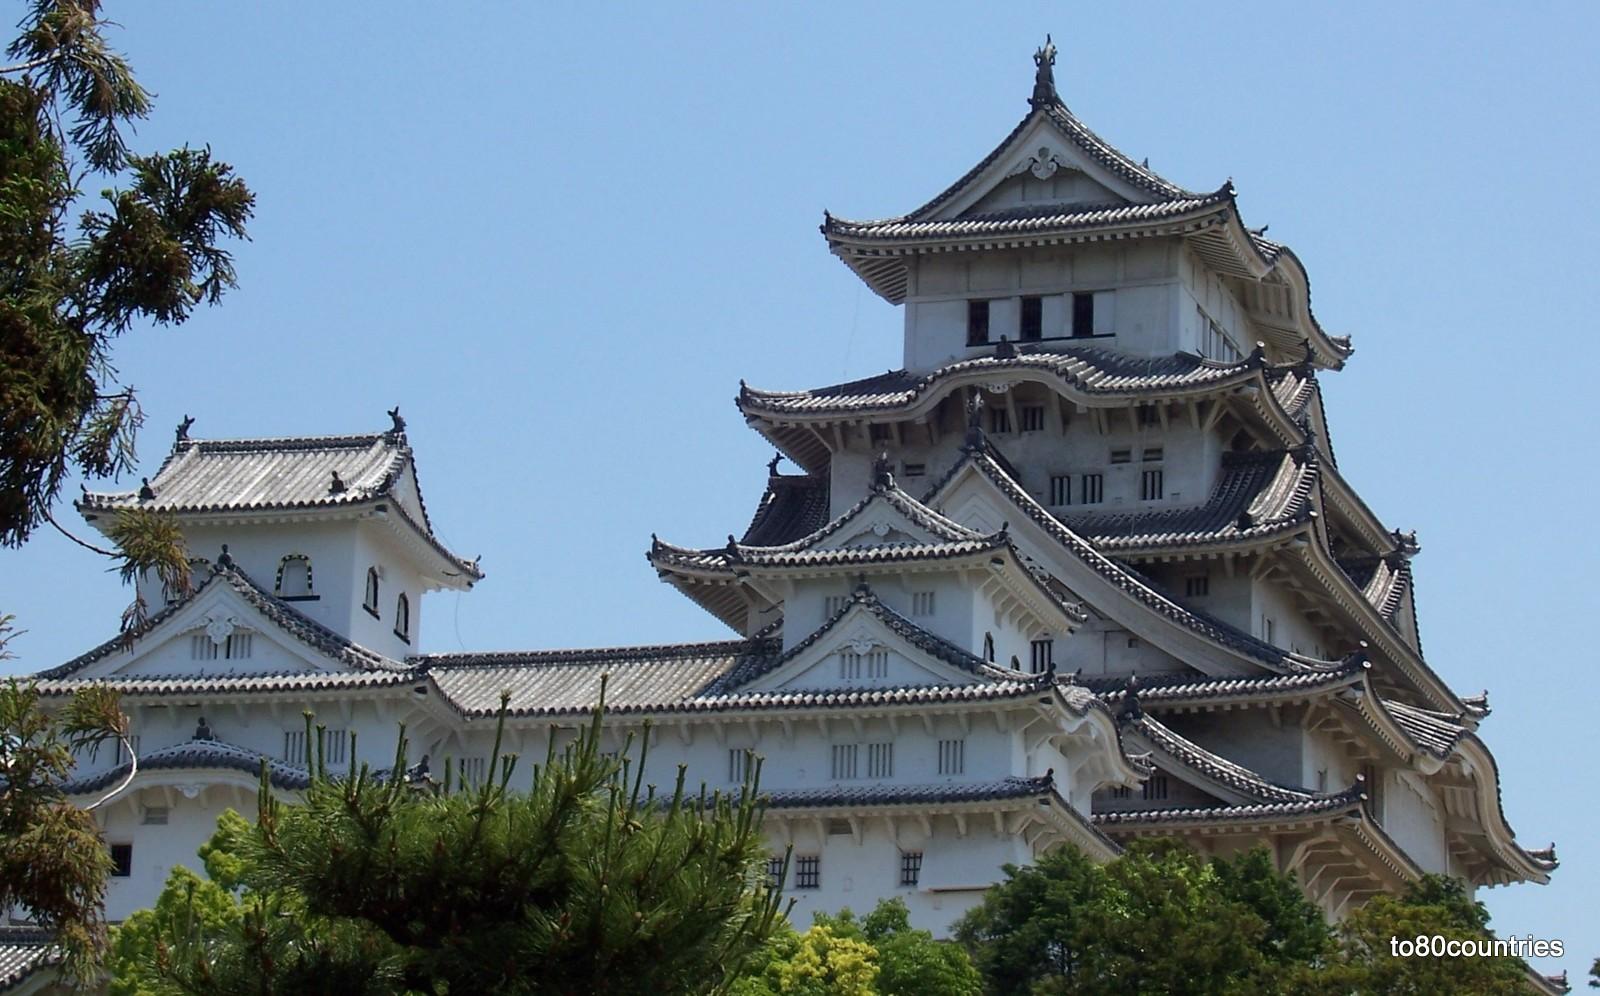 Schloss von Himeji auf Honshu